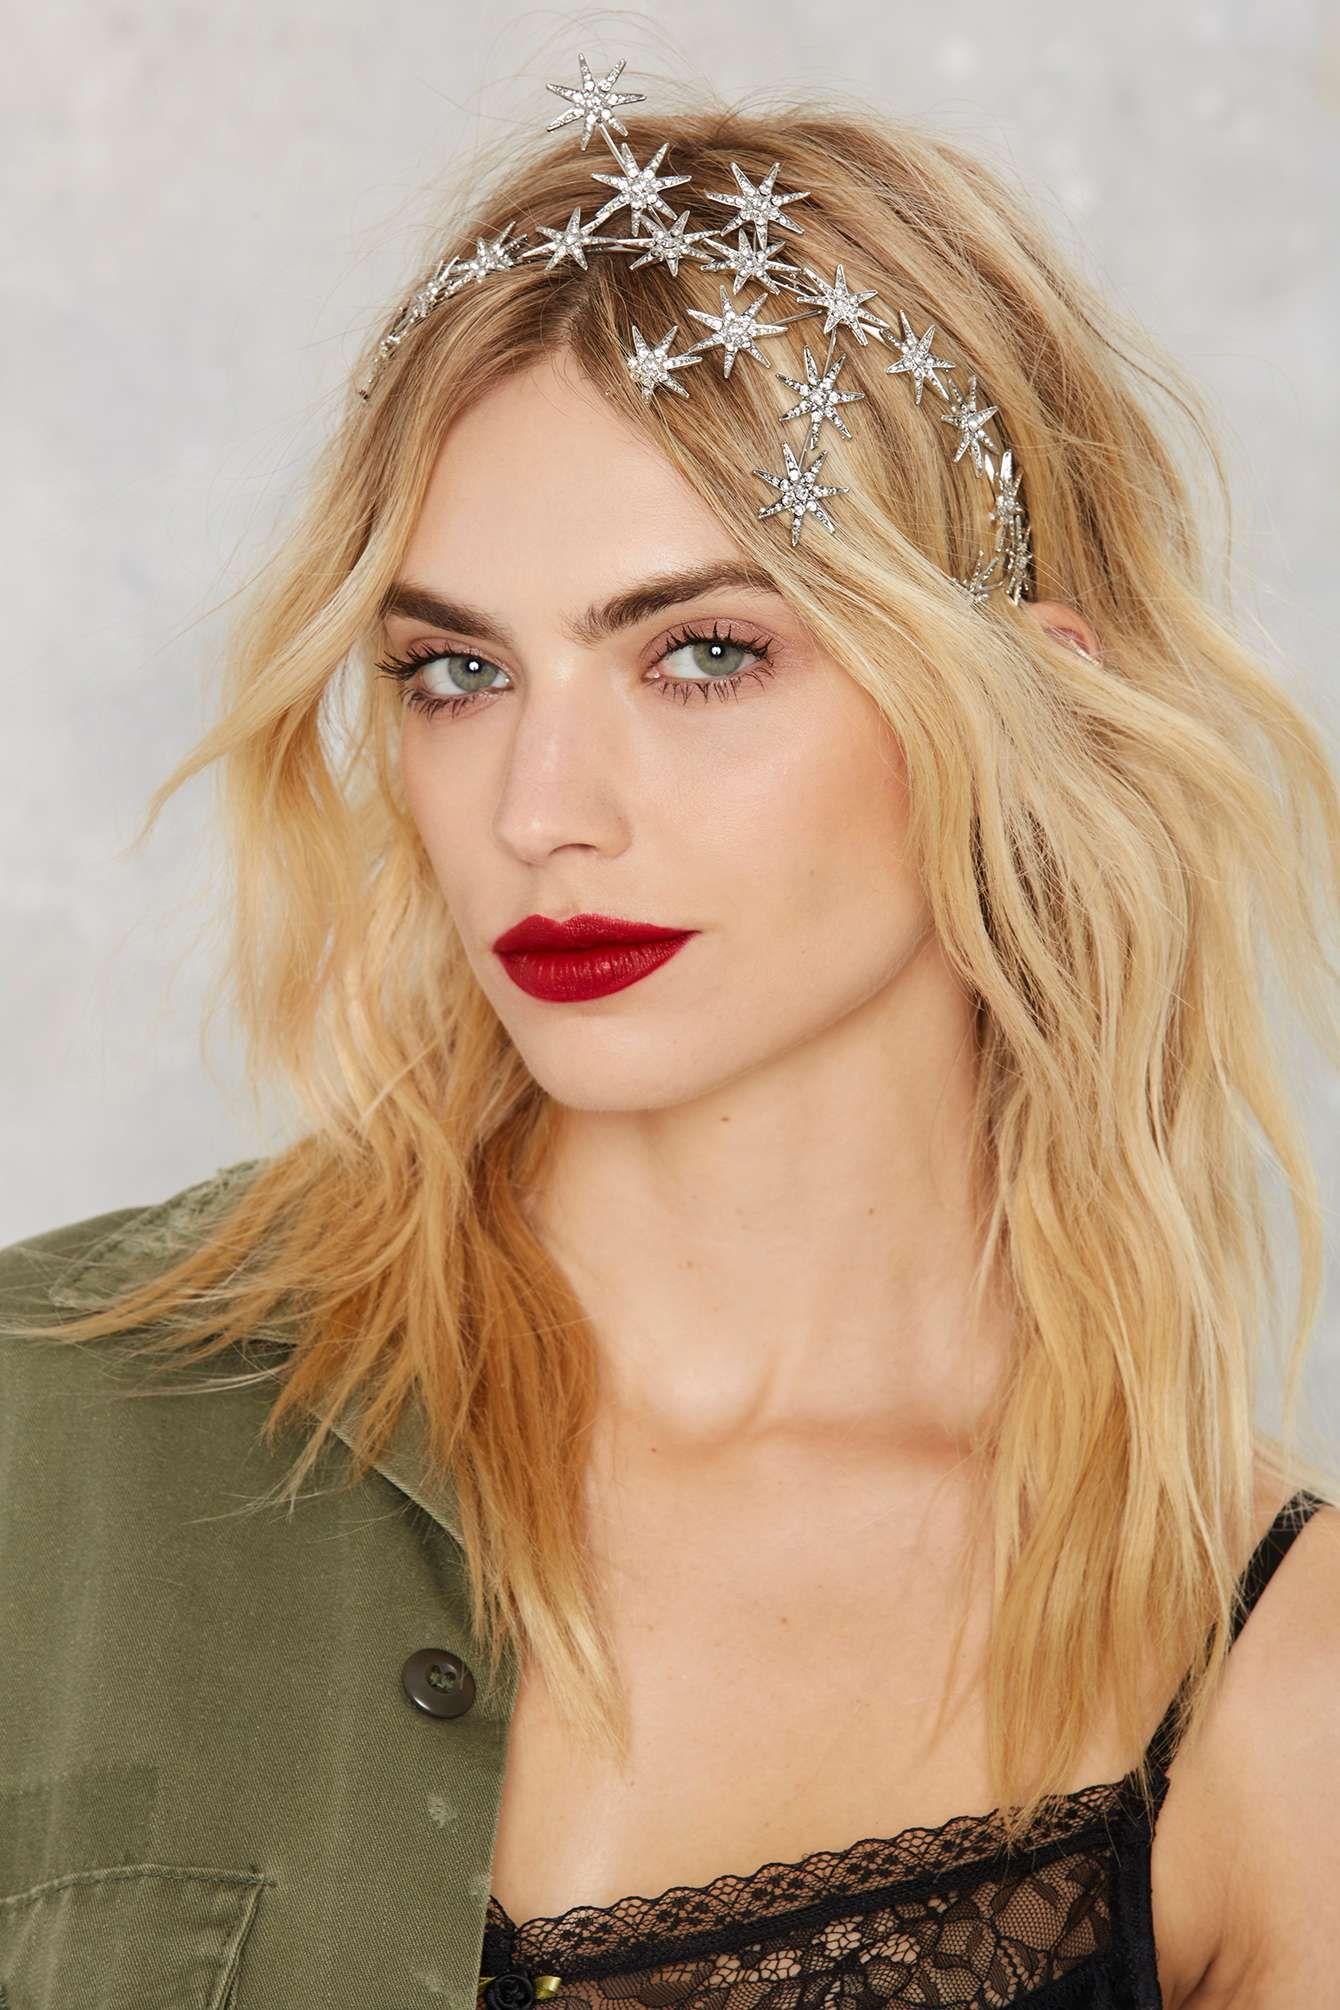 Women Girls Costumes Headband Shining Stars Headband for Party//Birthday